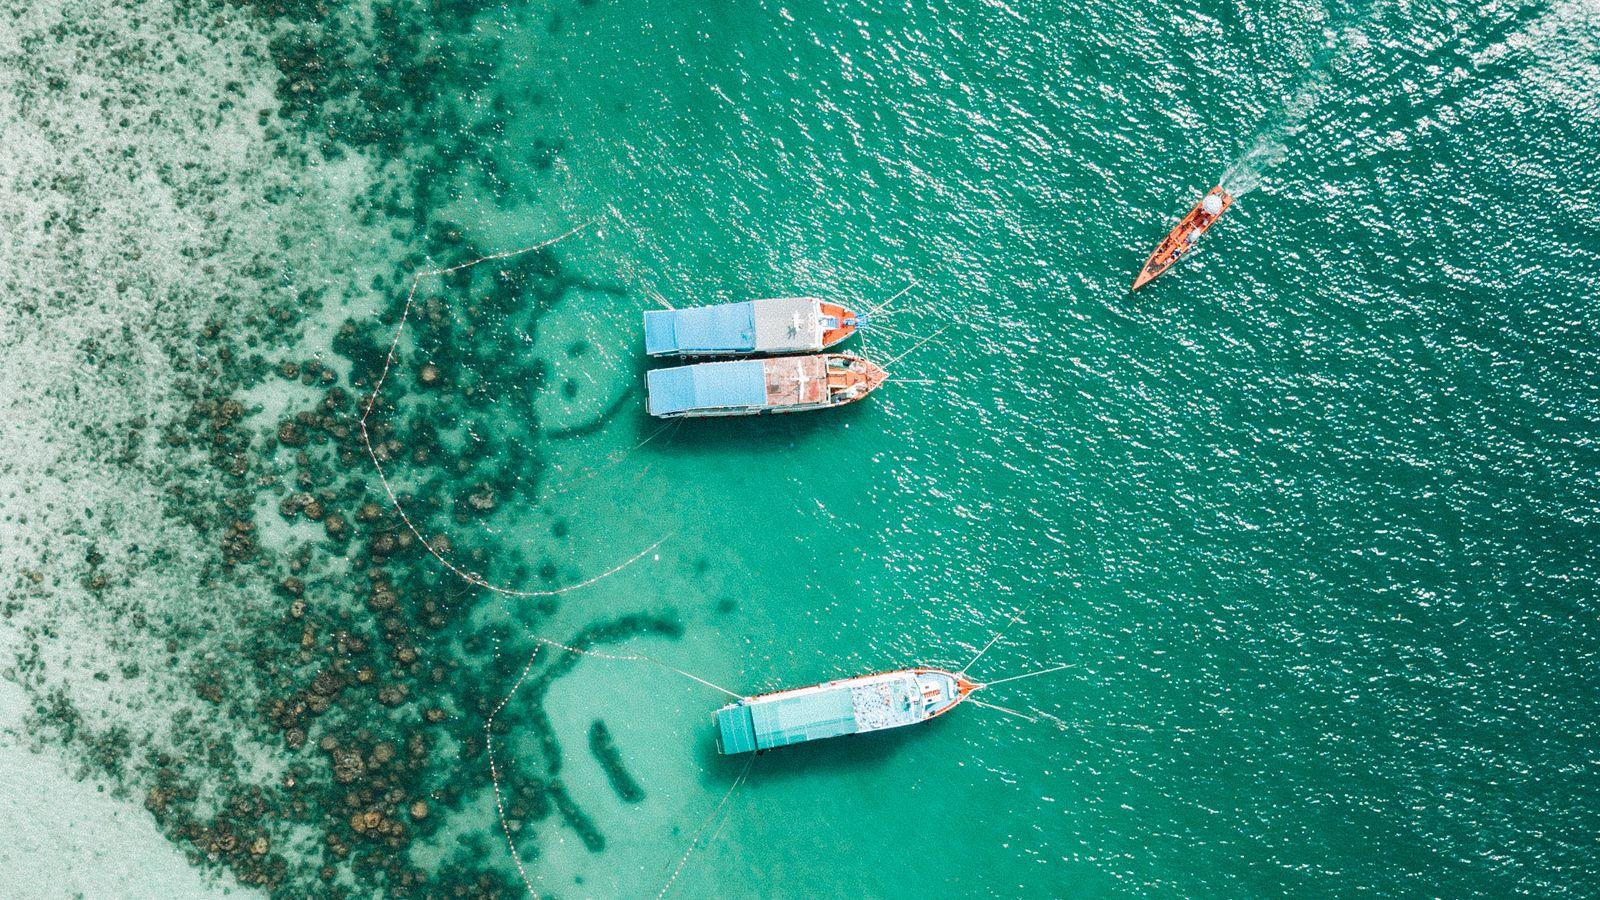 1600x900 Wallpaper shore, boats, sandbar, ocean, moored, aerial view